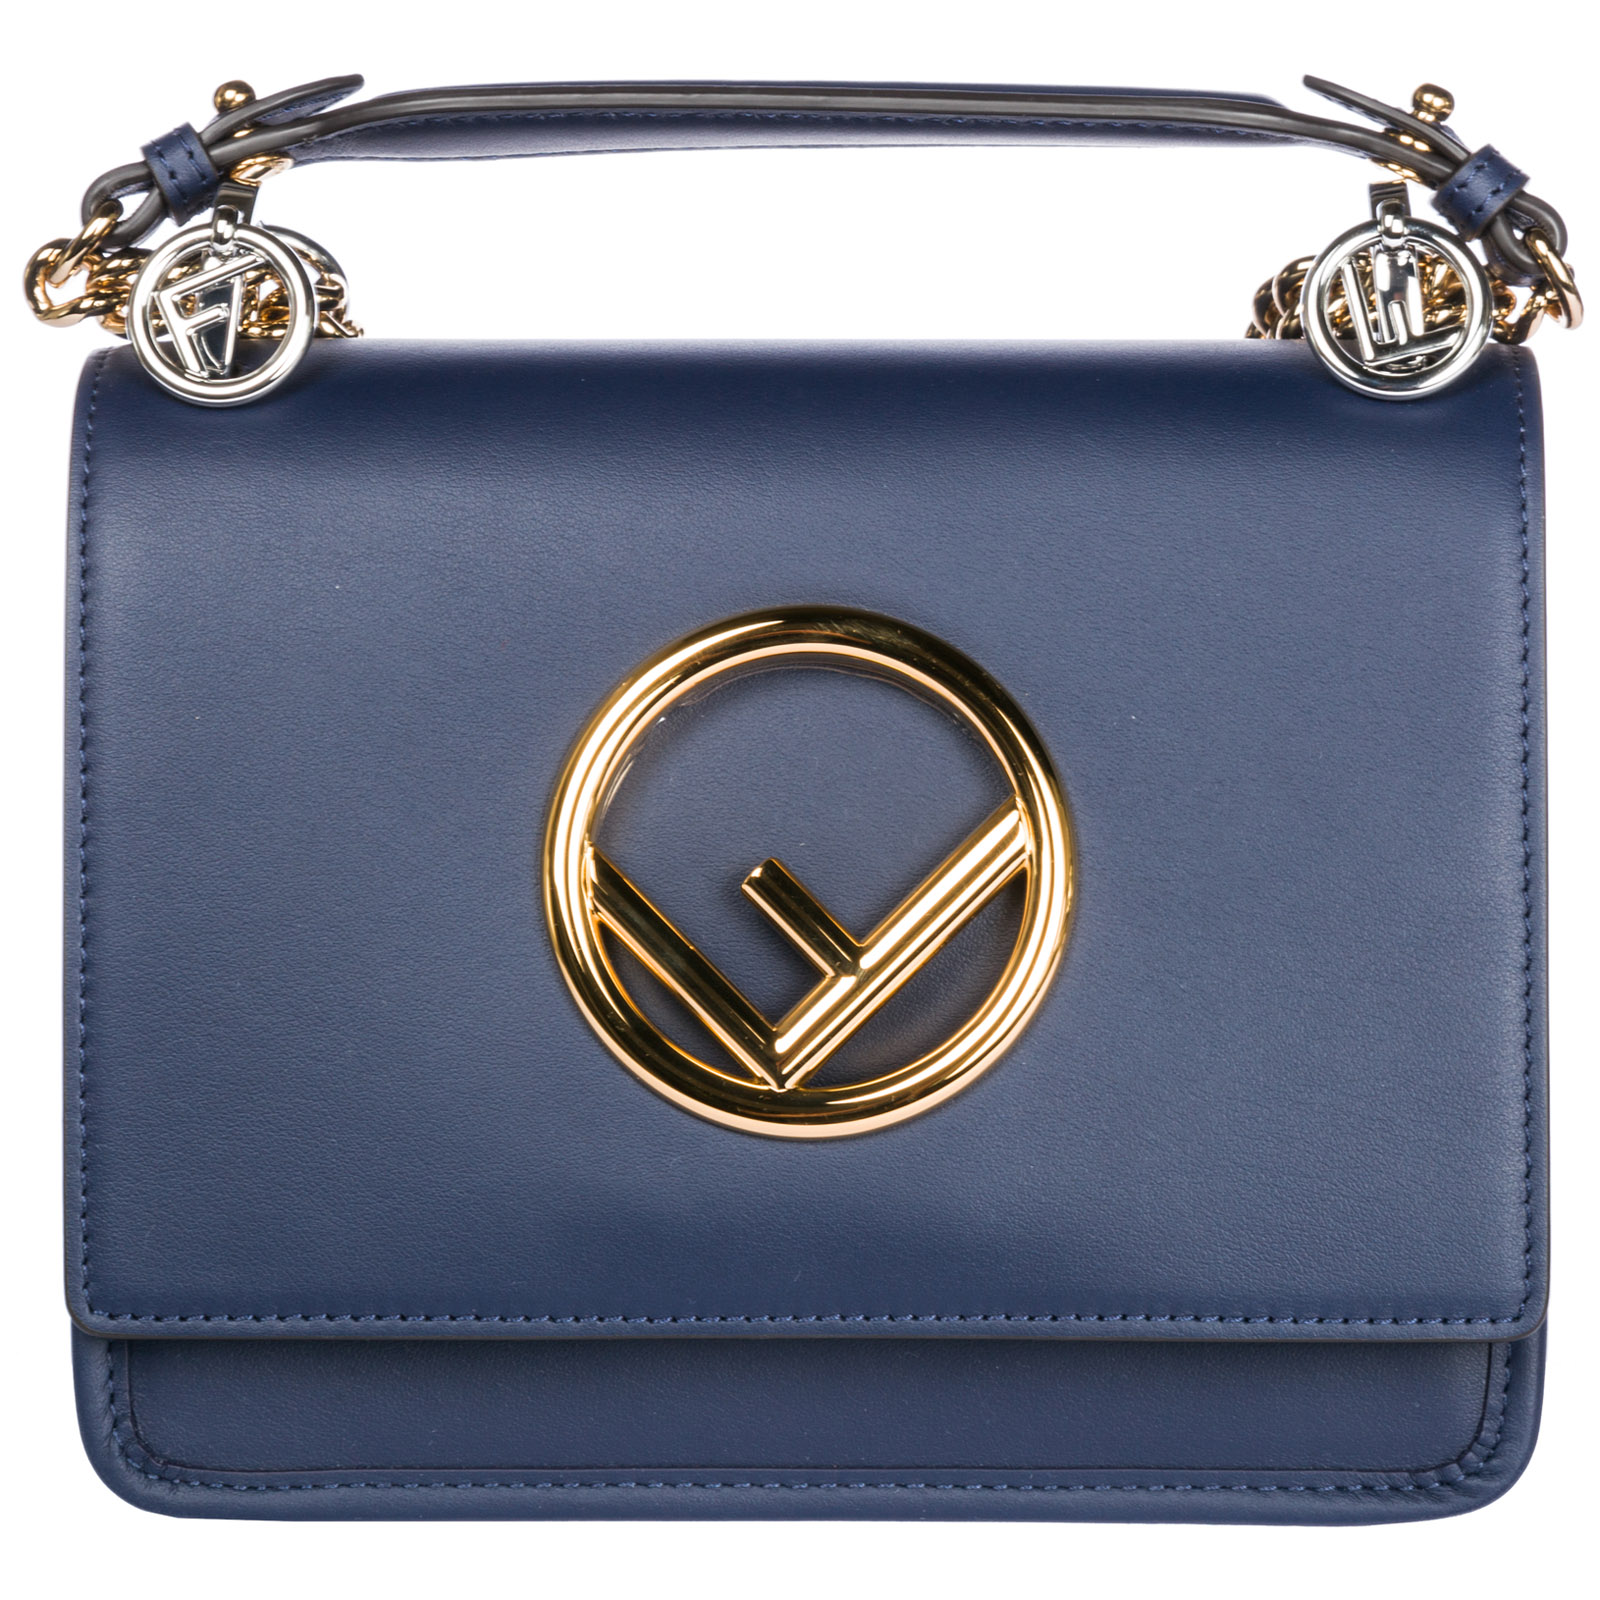 Schultertasche Leder Damen Tasche Umhängetasche Bag Kan I Logo Piccola, Blue